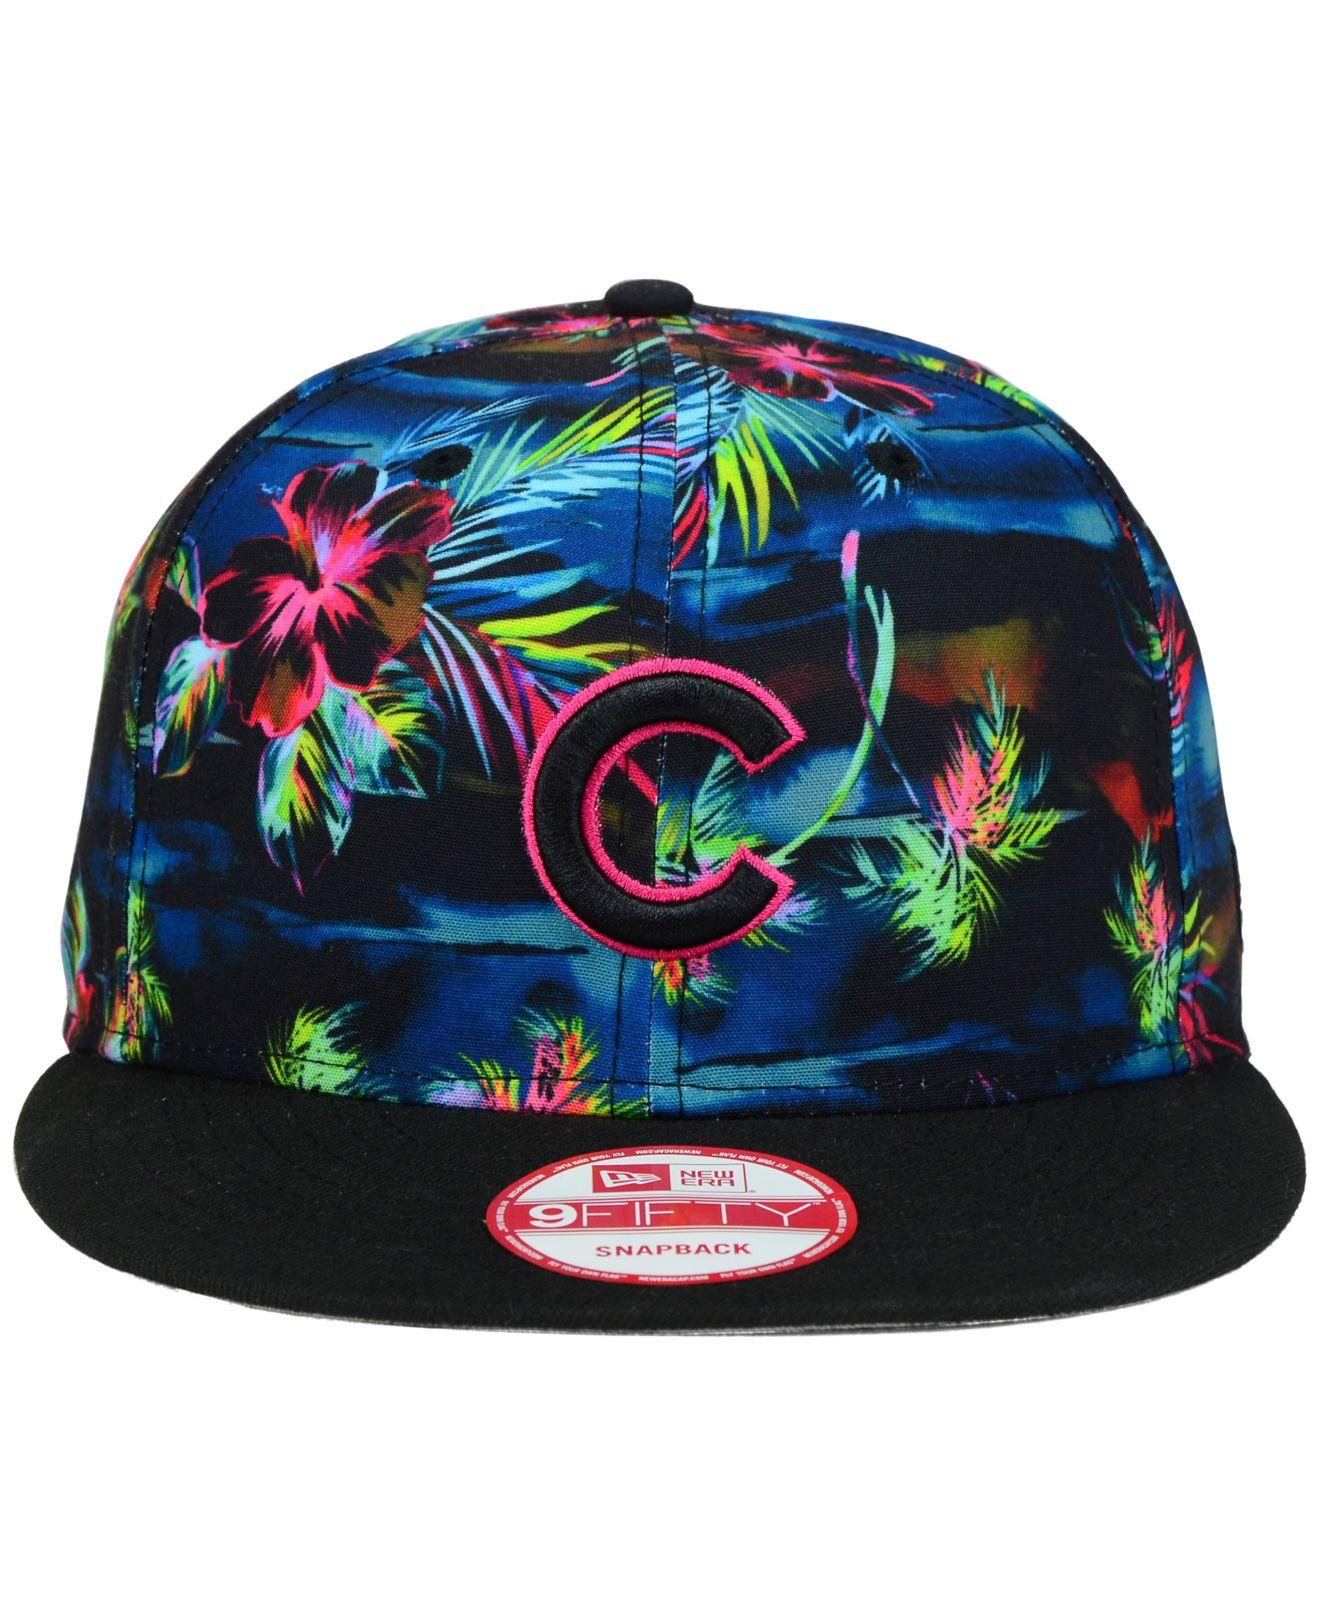 big sale 1184f e89bf ... canada lyst ktz chicago cubs dark tropic 9fifty snapback cap in blue  for men 5809e e425c